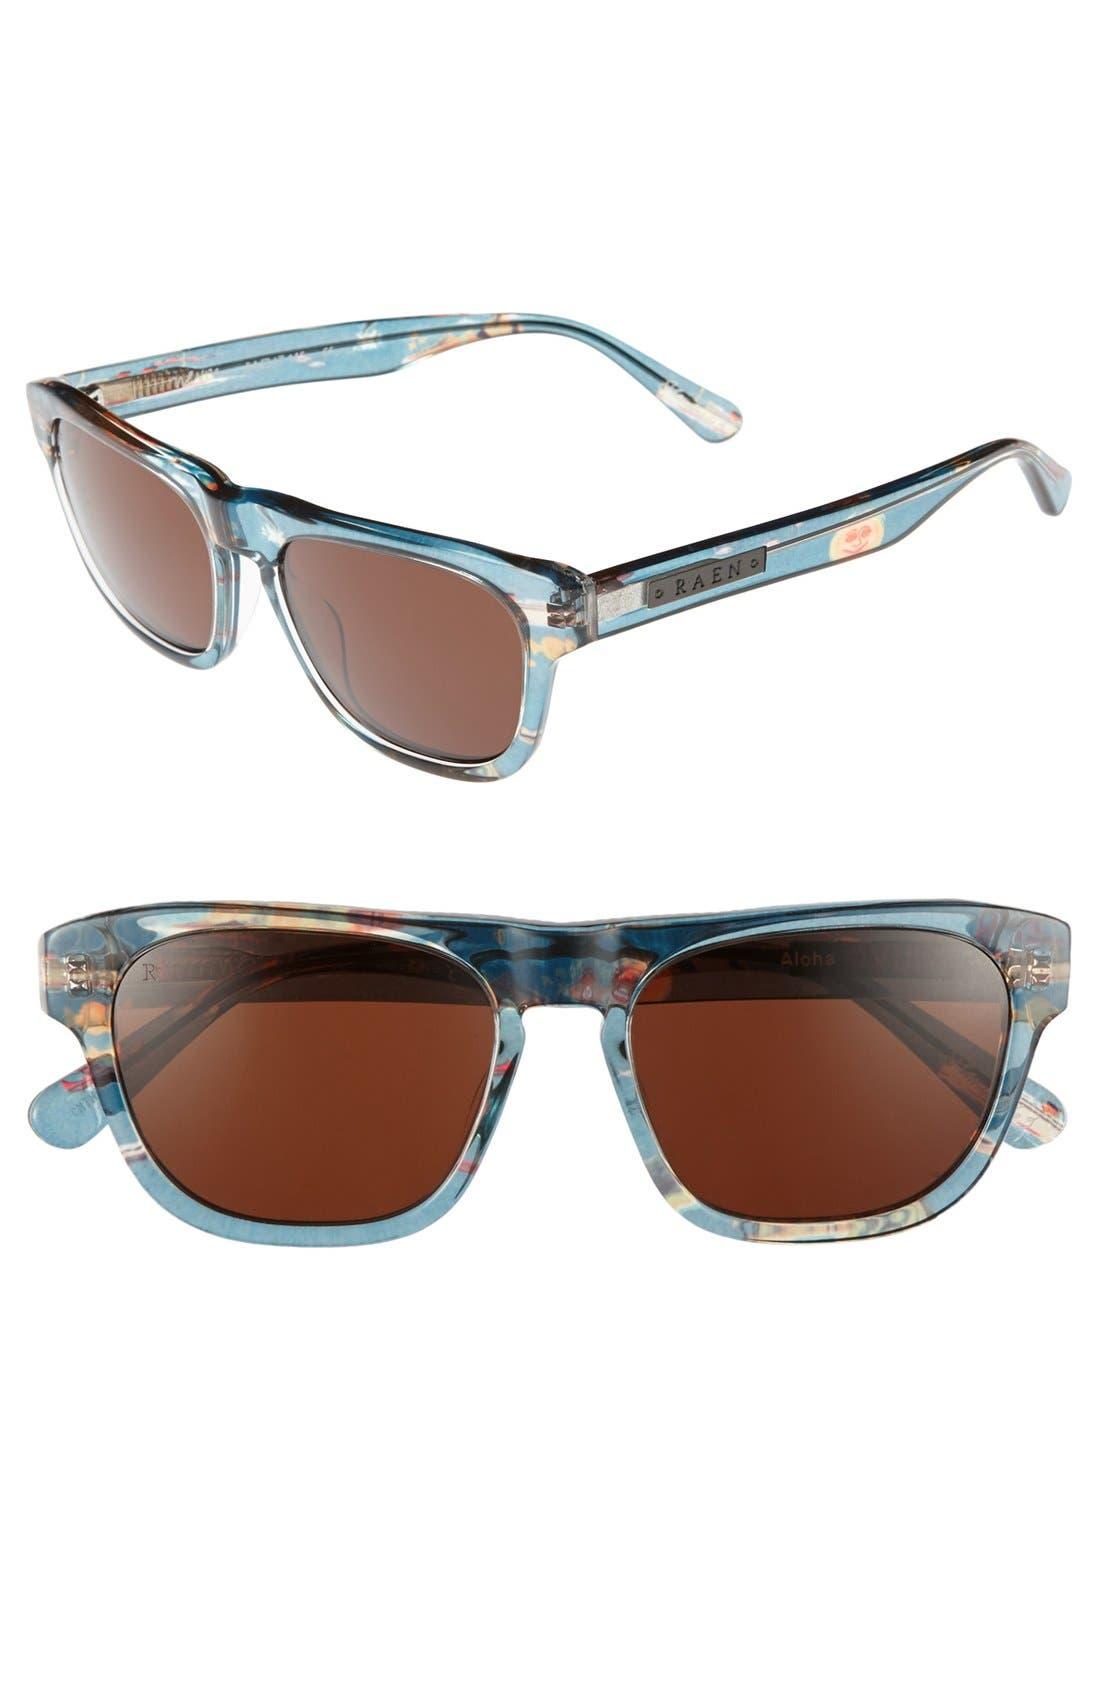 Main Image - RAEN 'Nevin' 54mm Sunglasses